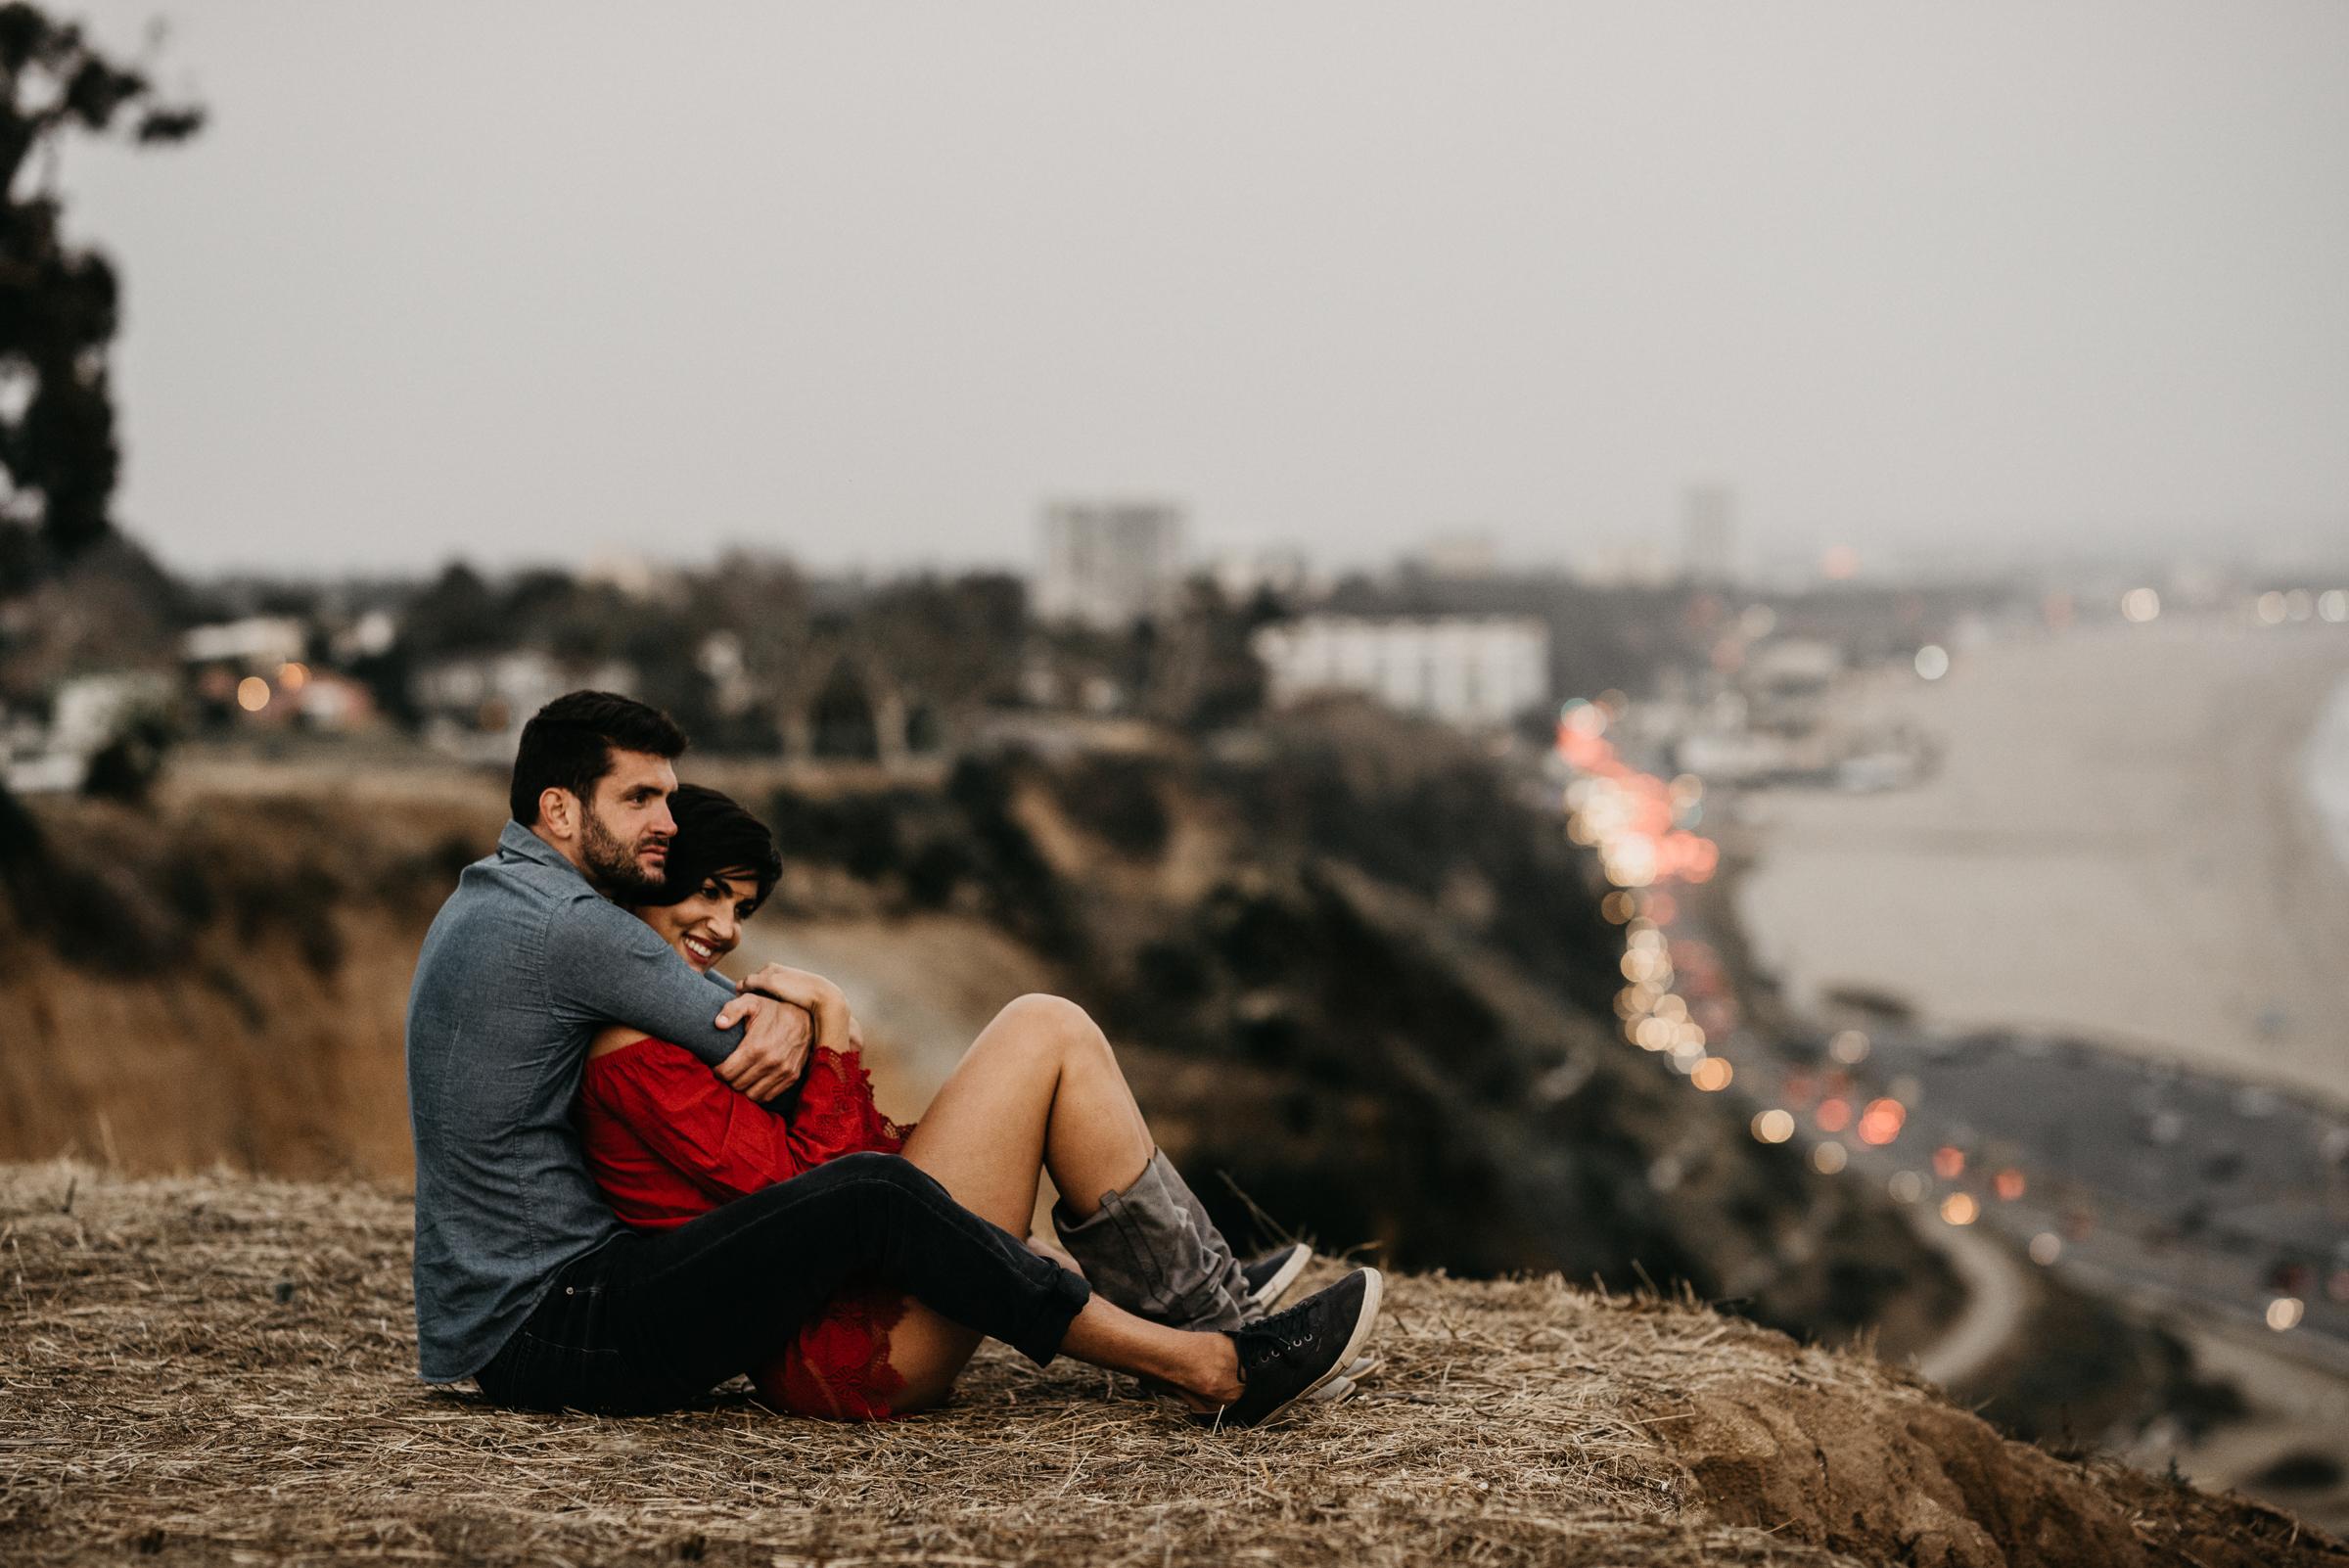 Isaiah + Taylor Photography - Santa Monica Engagement Session, Los Angeles Wedding Photographer-060.jpg